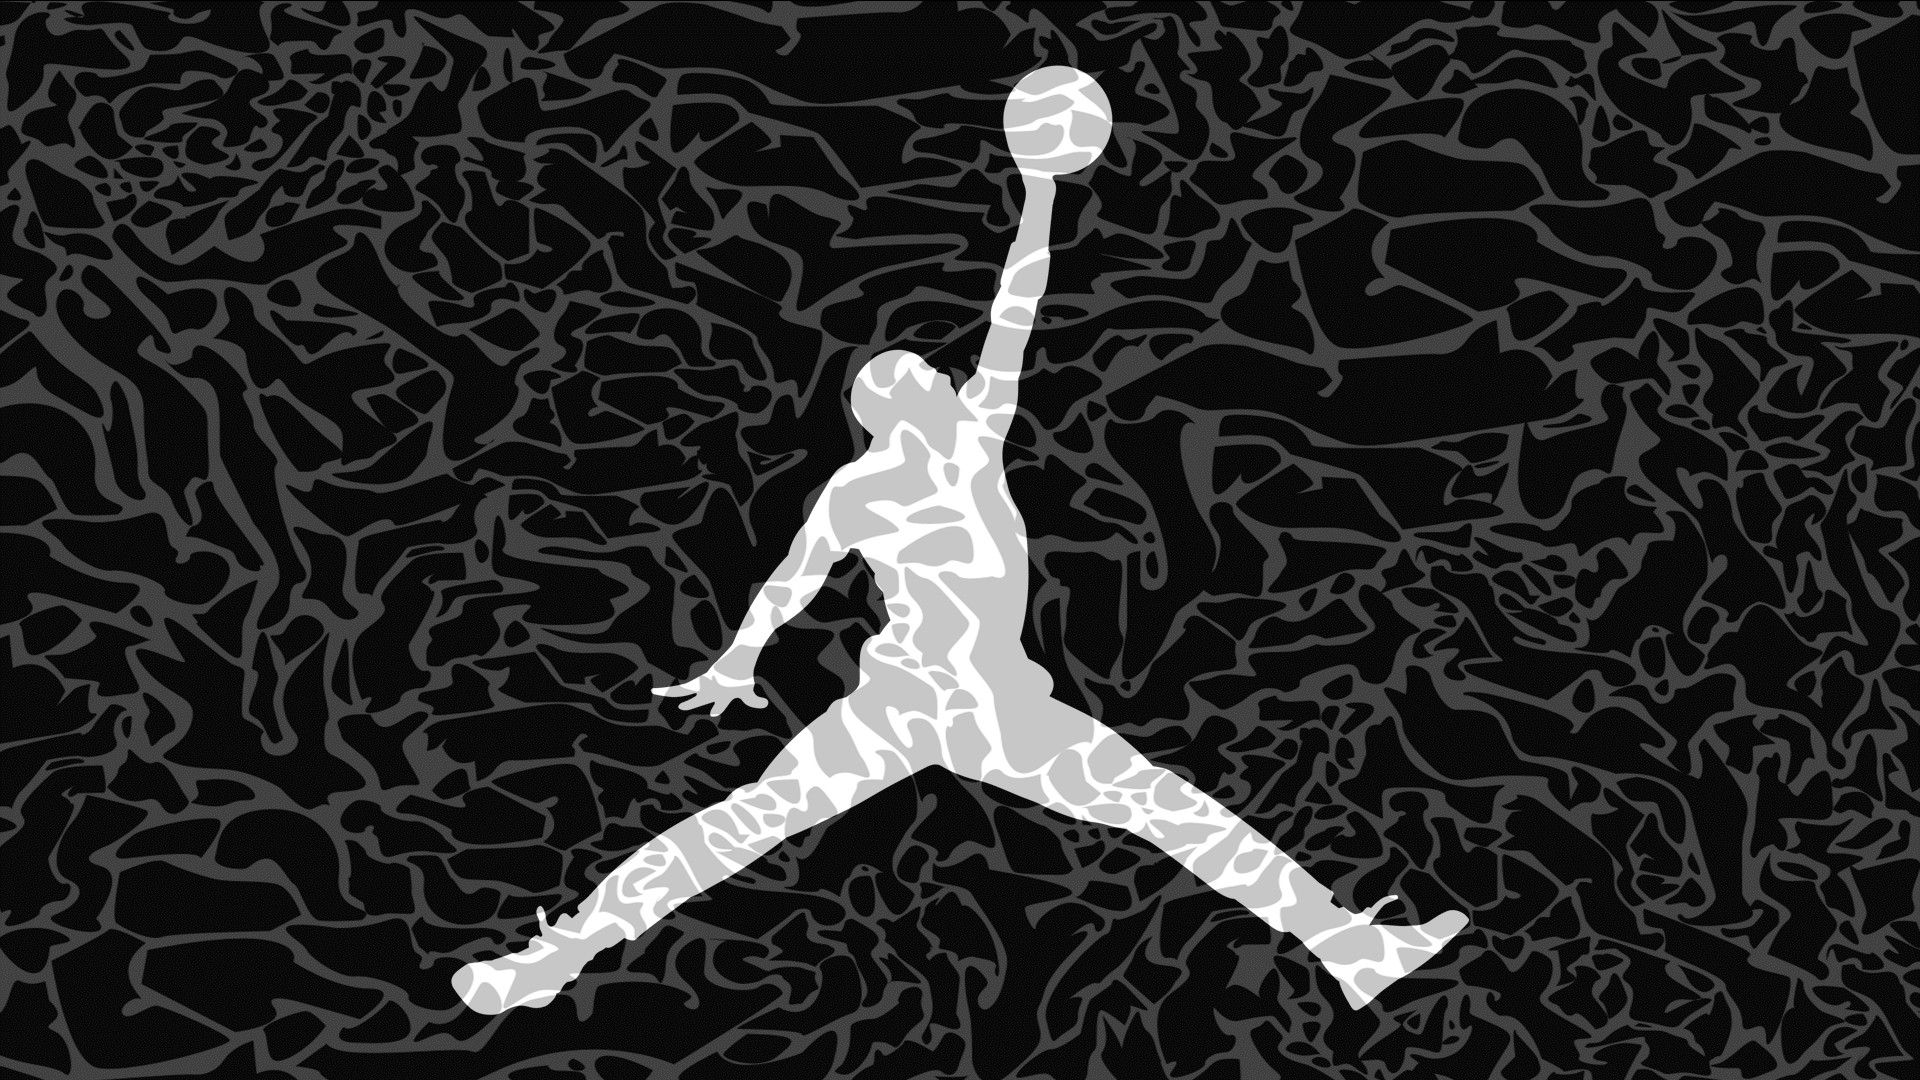 Cool Jordan Wallpapers   Top Cool Jordan Backgrounds 1920x1080